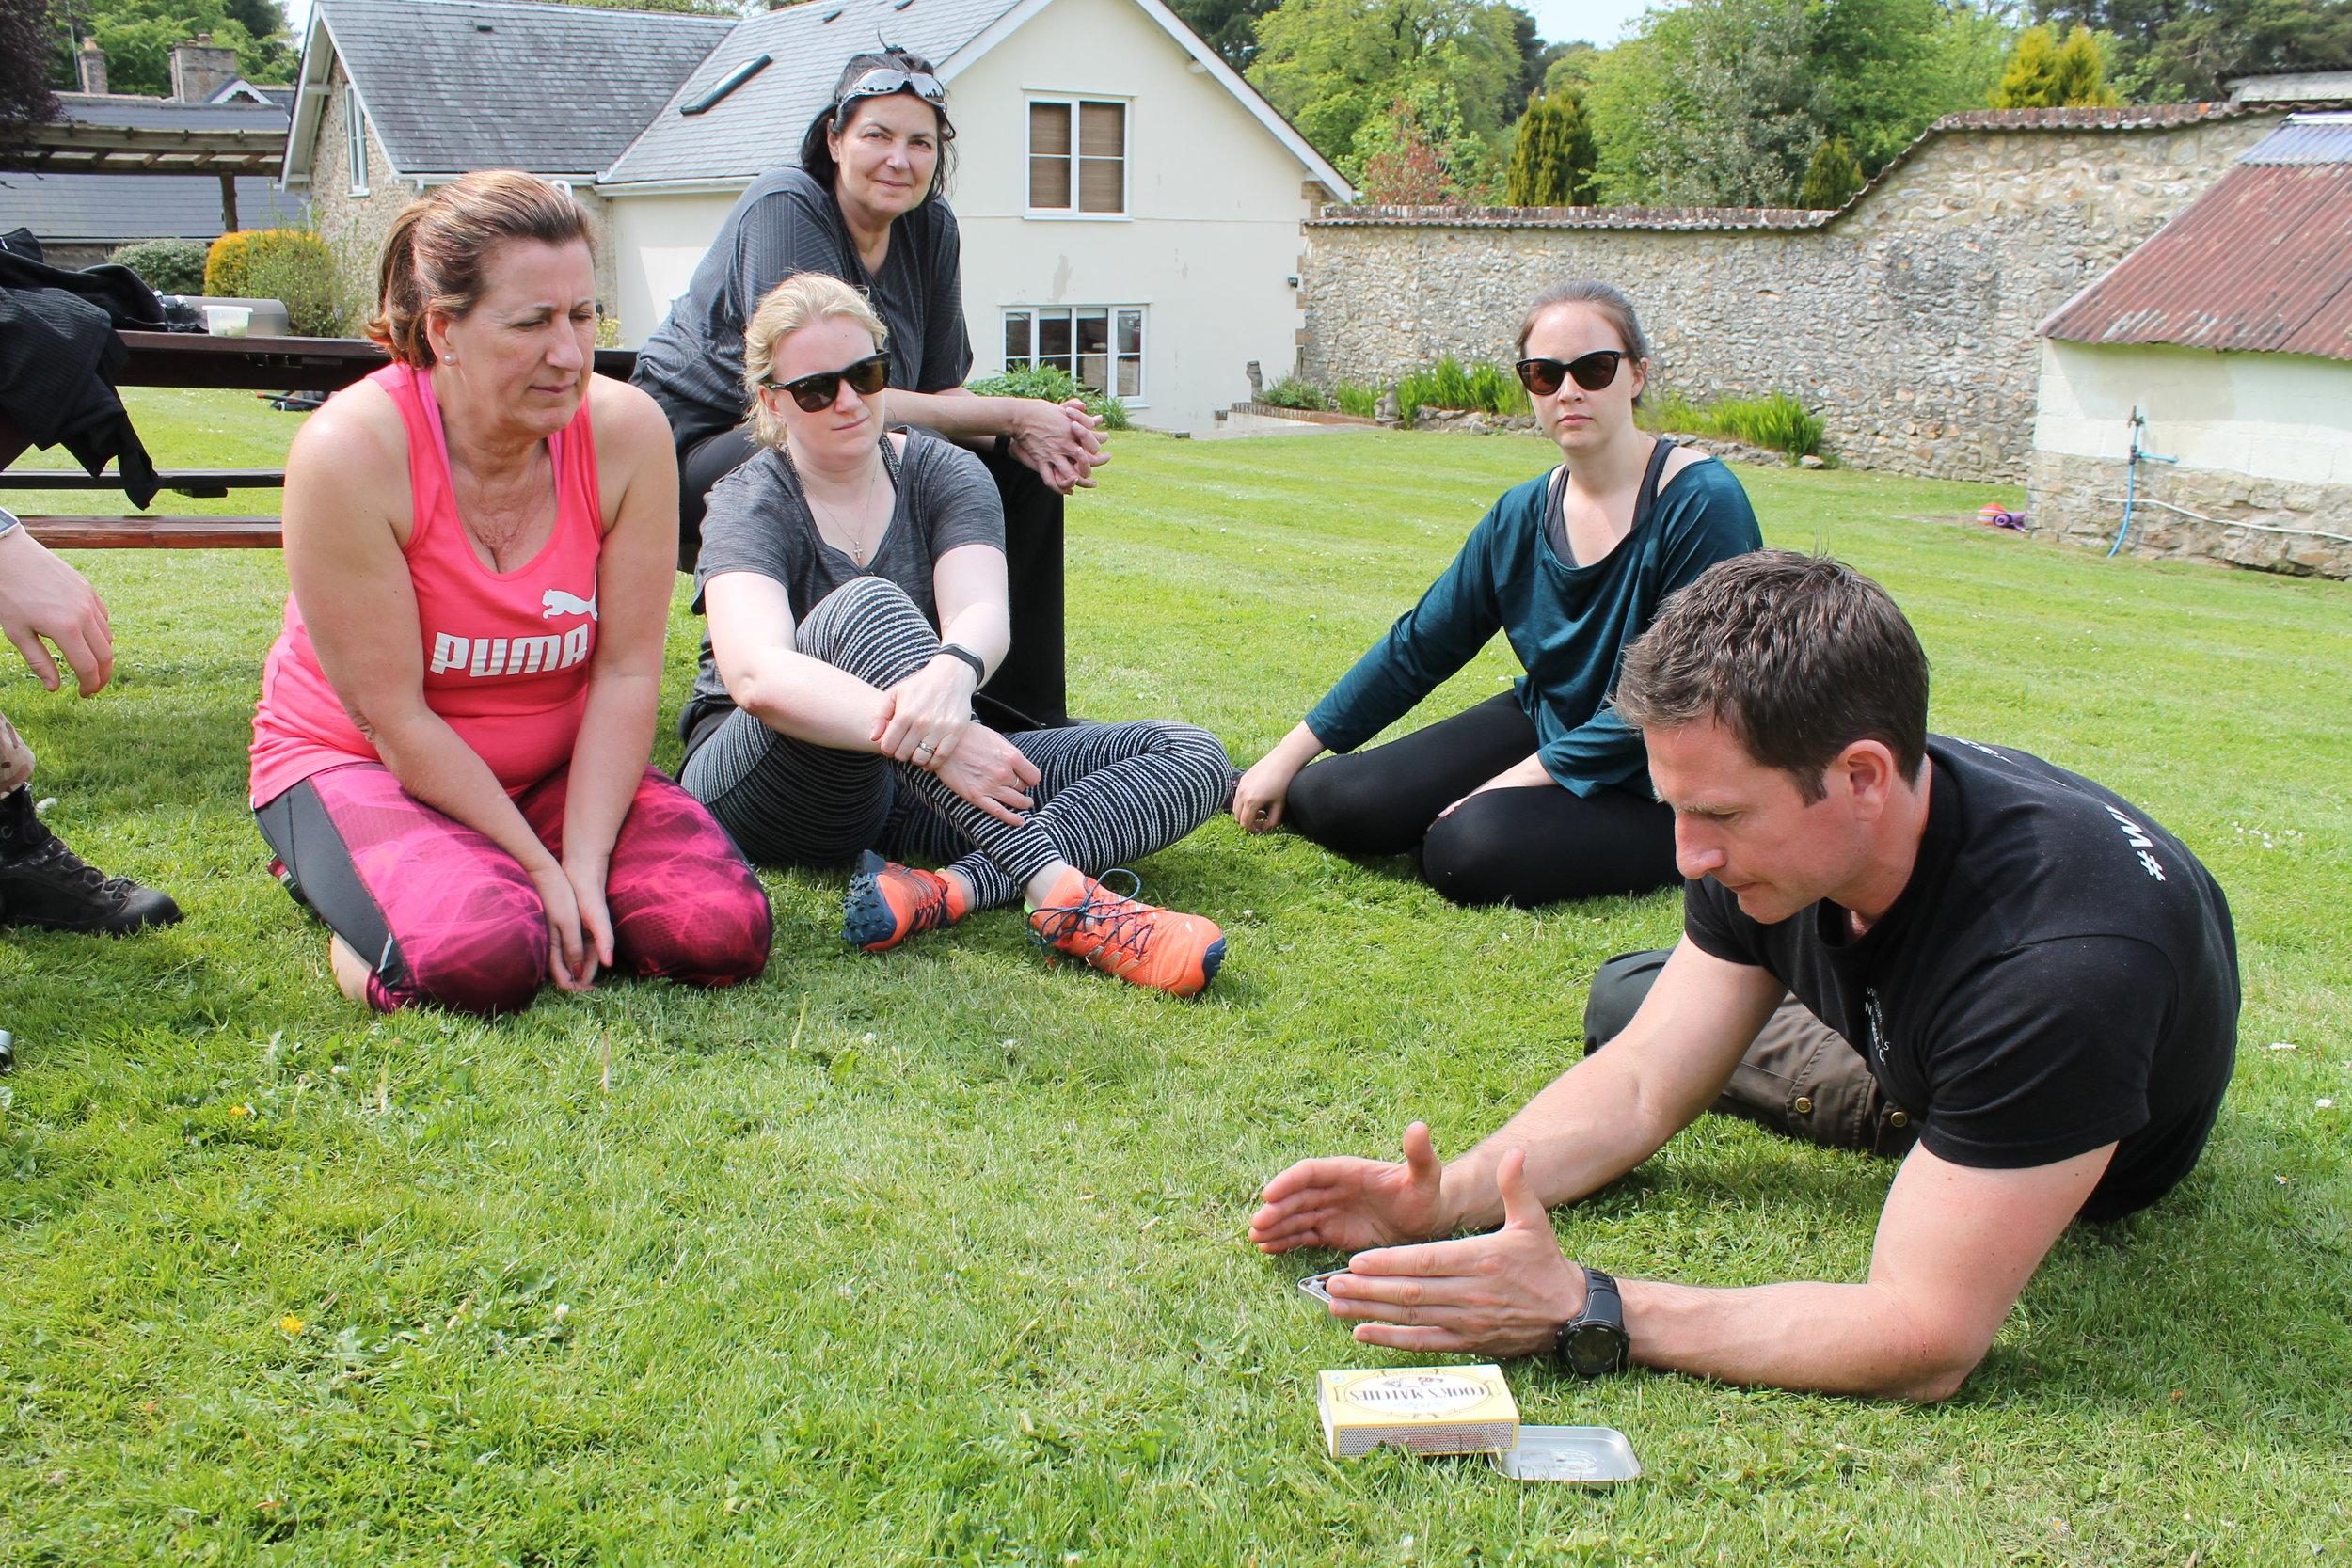 SAS instructors show you some survival skills